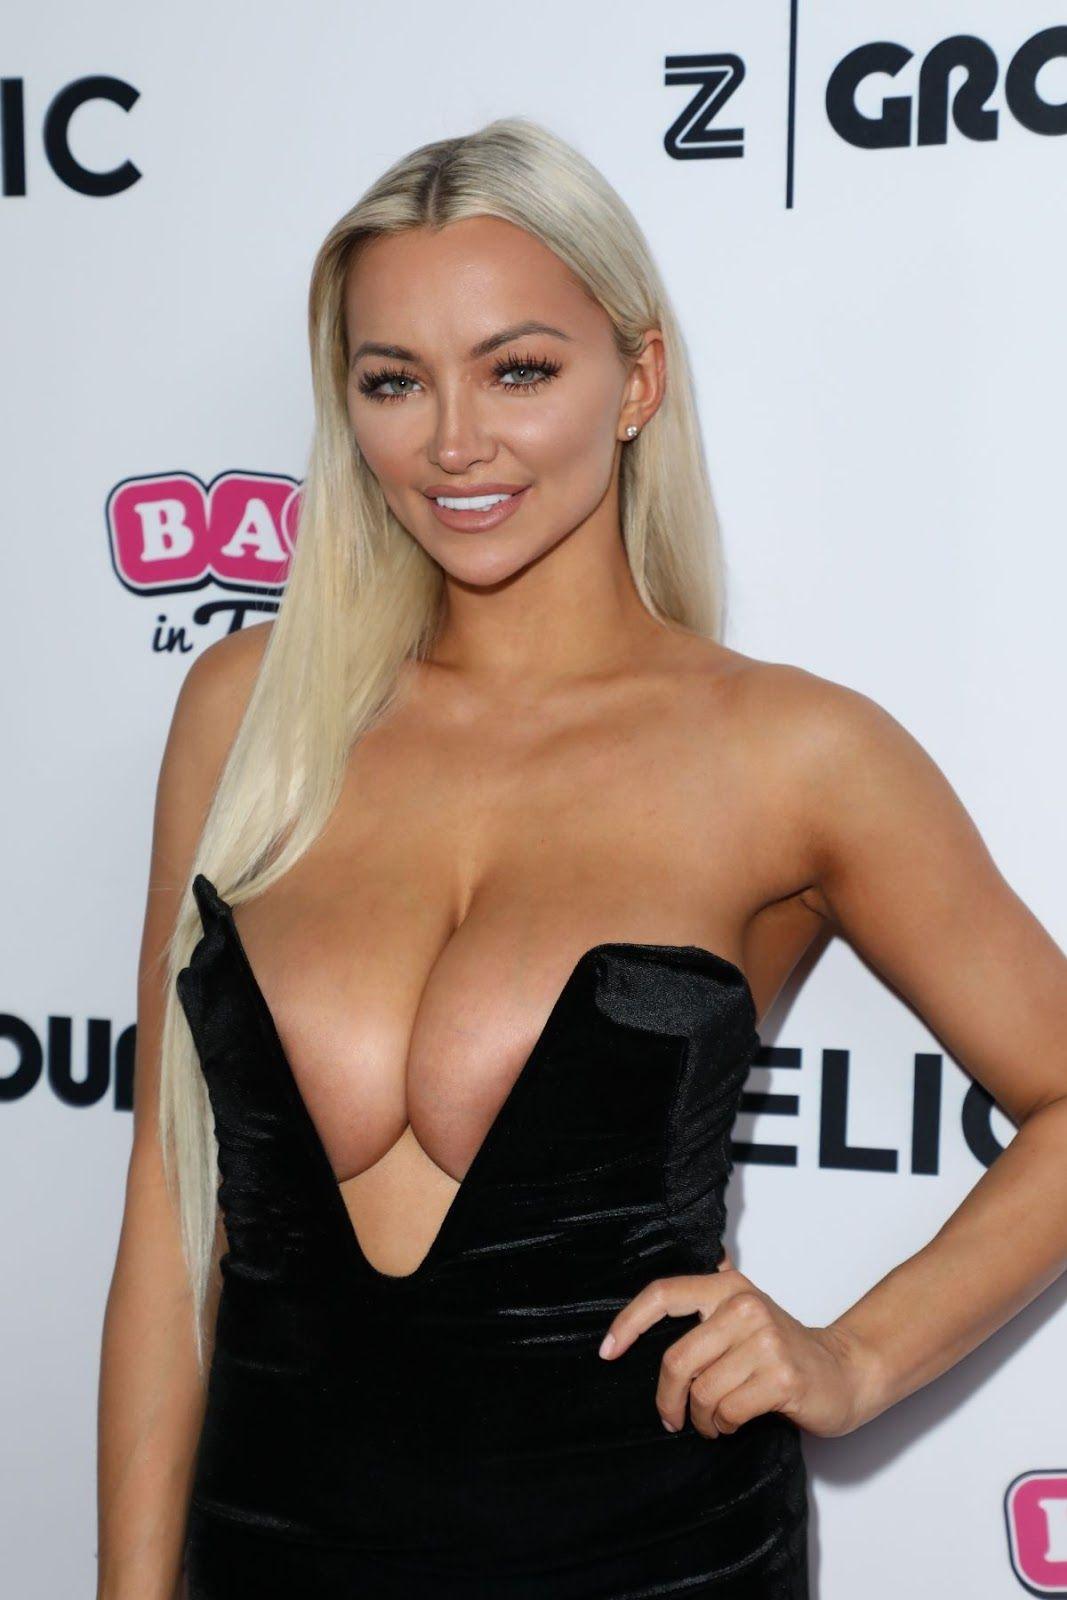 Dani Thorne Sexy Photo. 2018-2019 celebrityes photos leaks! nude (56 photos)